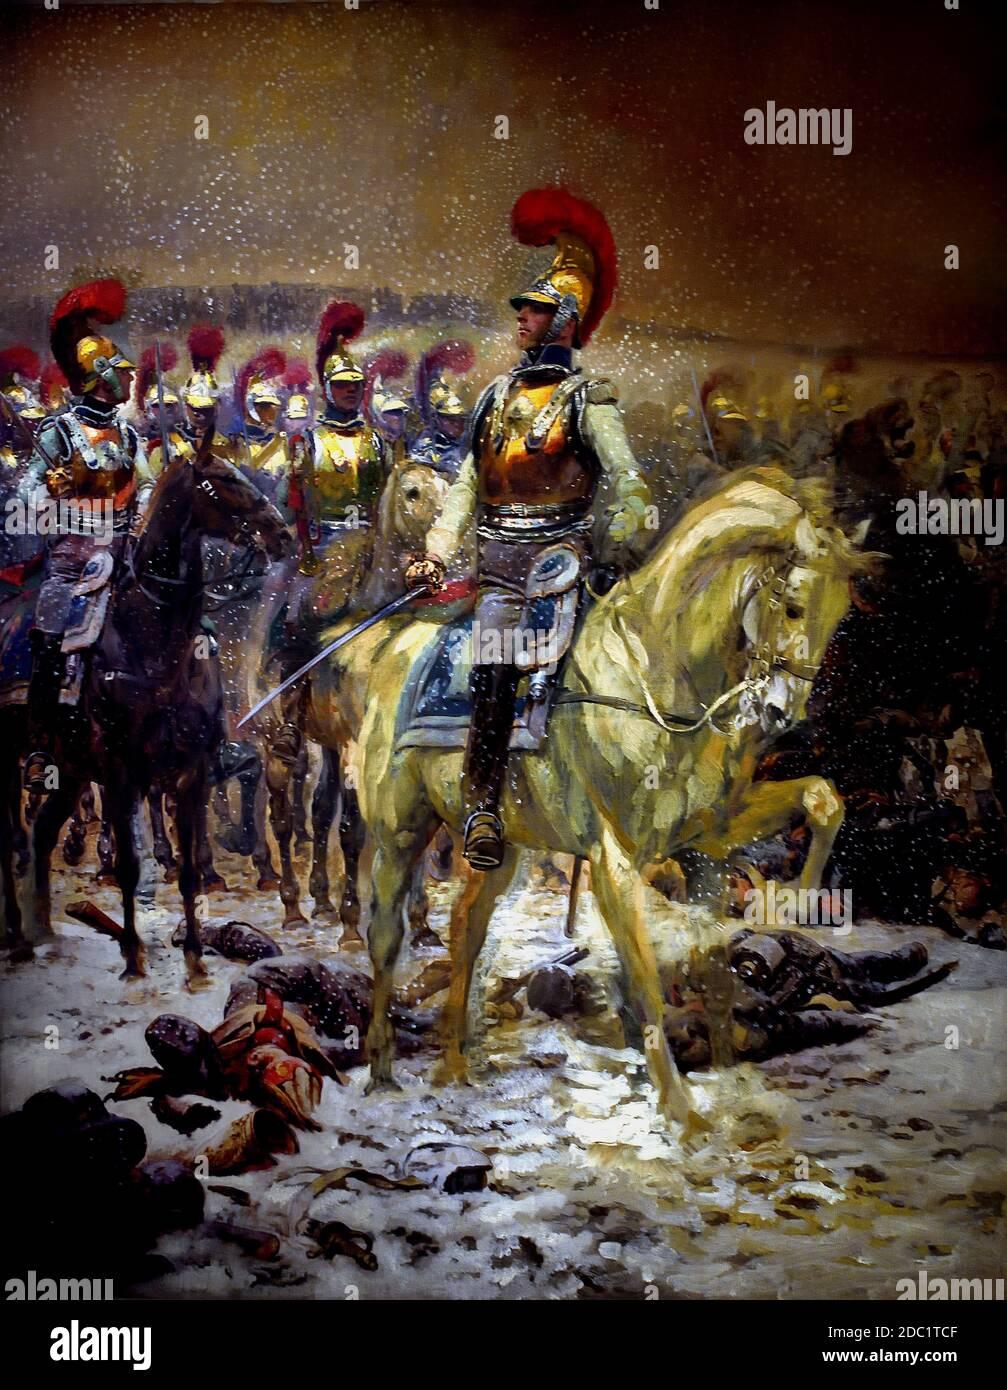 Antes de la carga. Los Carabiniers en Winkowo , 1900, Jean-Baptiste Édouard Detaille, 1848 – 1912, Alphonse de Neuville, 1835-1885, Francia, francés, alemán, Alemania, Foto de stock